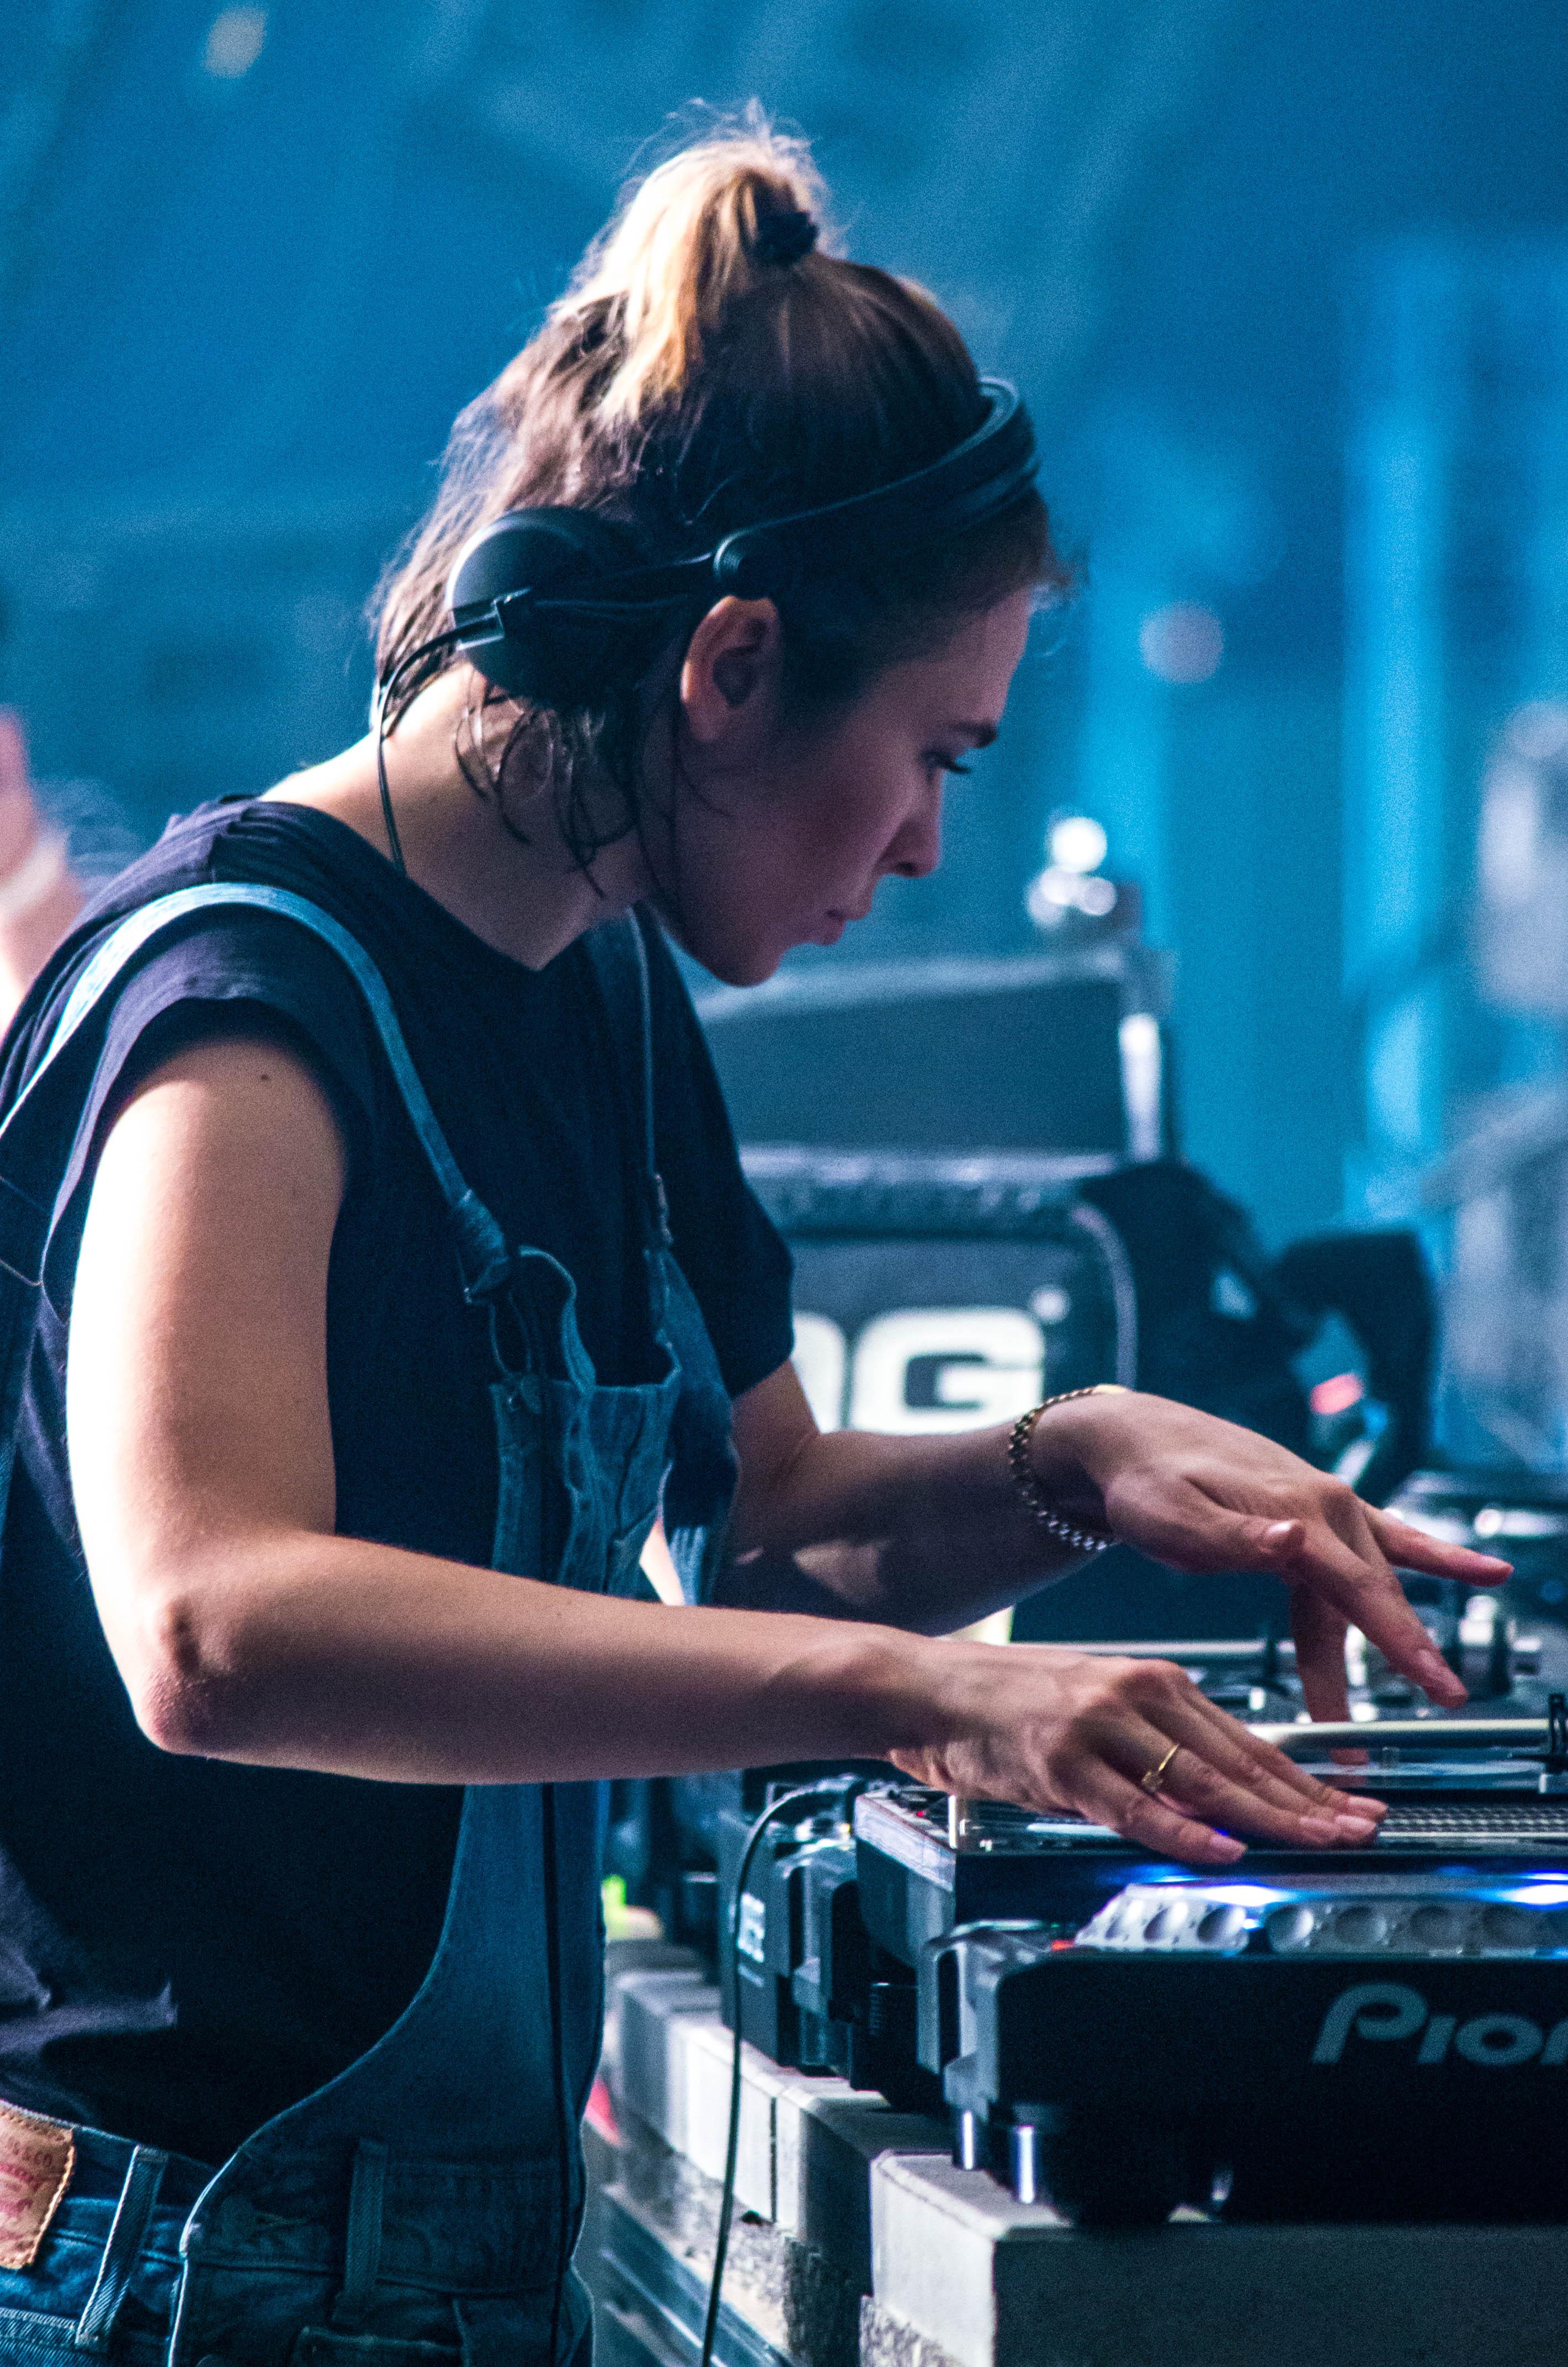 Weather Festival - Nina Kraviz